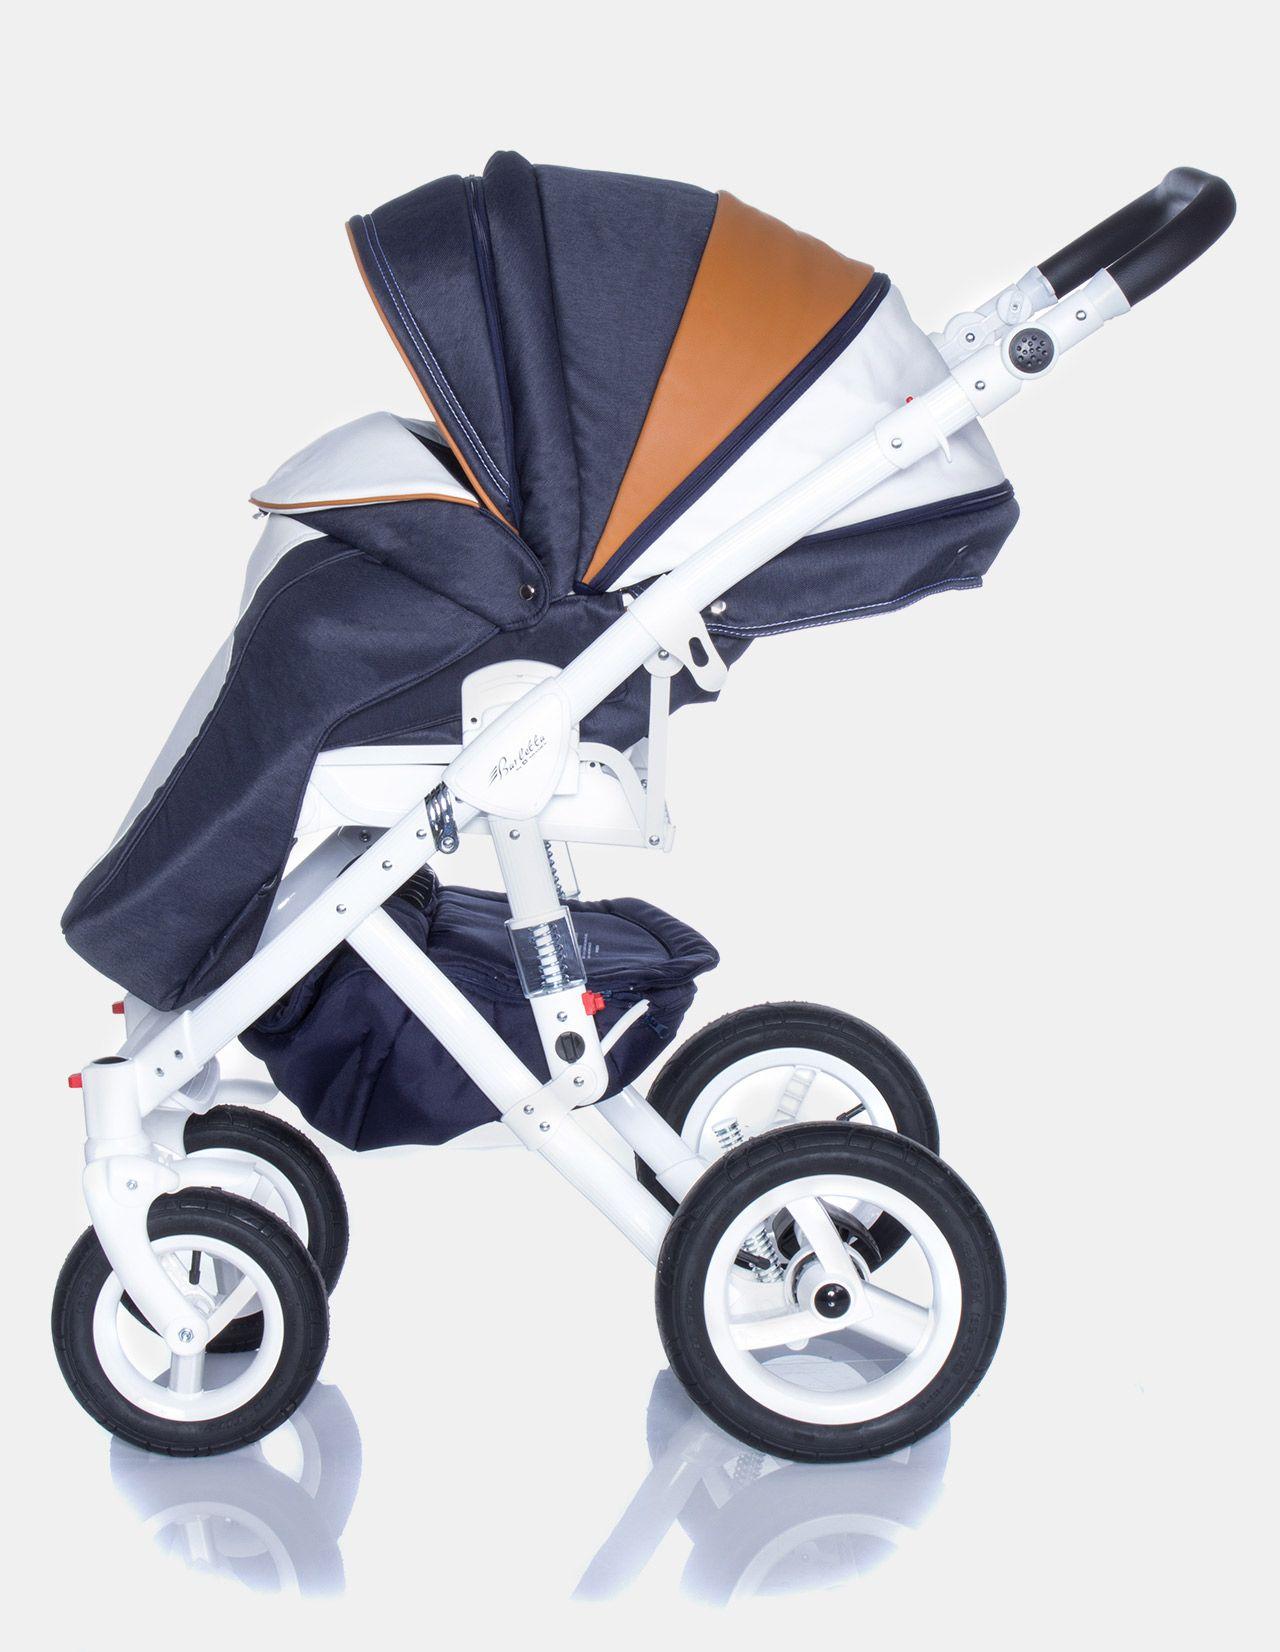 Kinderwagen zwillinge maxi cosi  Adamex Barletta New B7 Karamell-Dunkelblau 3in1   Kinderwagen ...